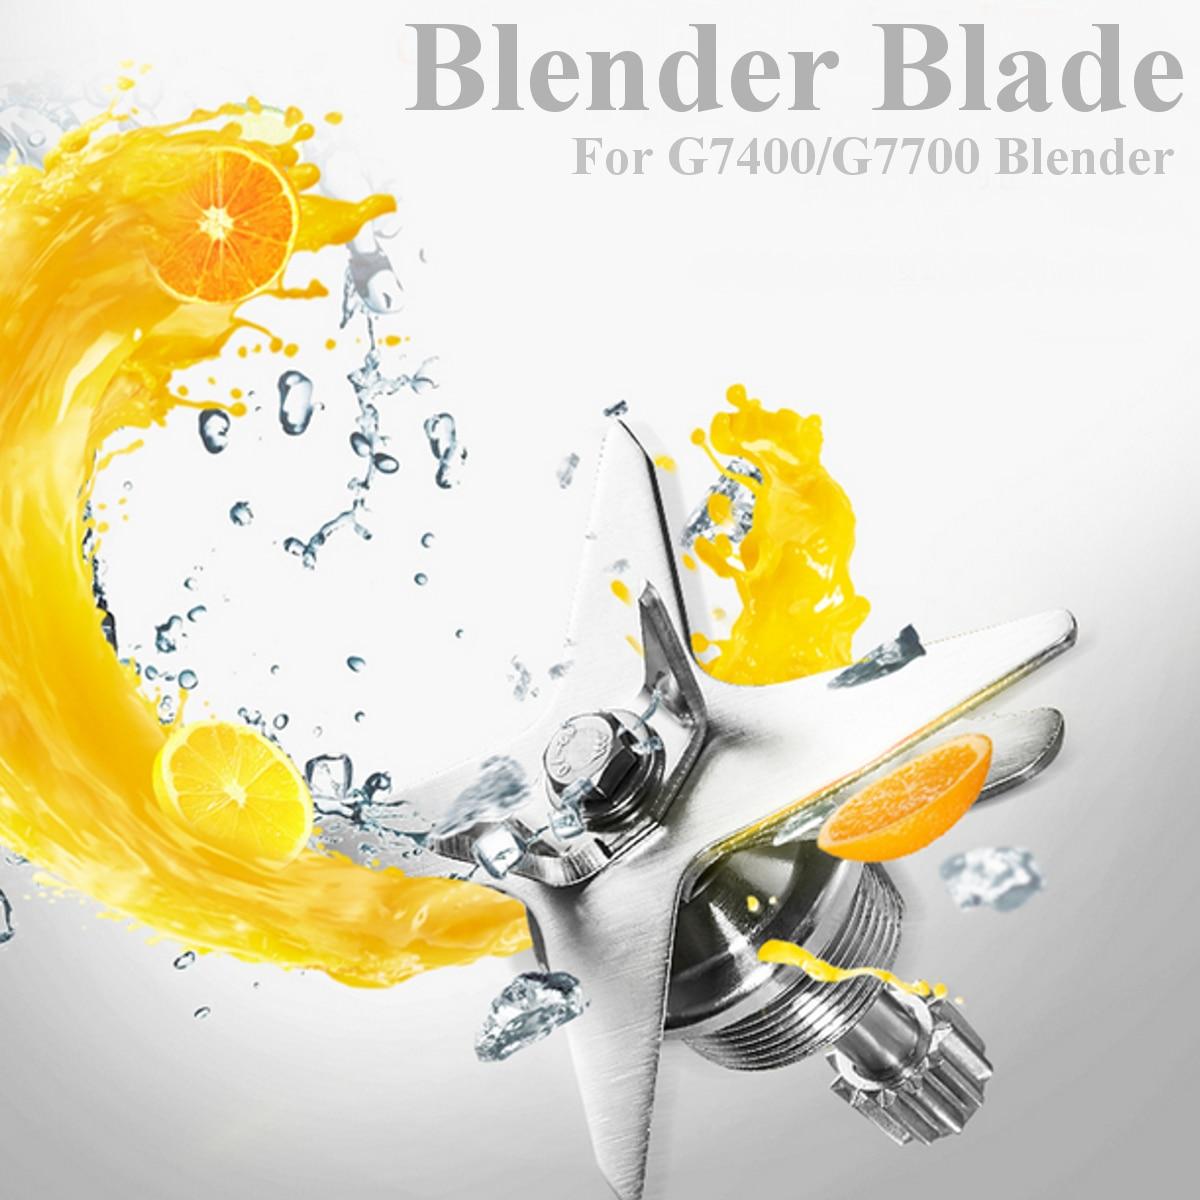 Fit For G7400/G7700 Blenders Blender-Cutter Head Stainless Steel Silver High Hardness Durable Blender-Parts стоимость